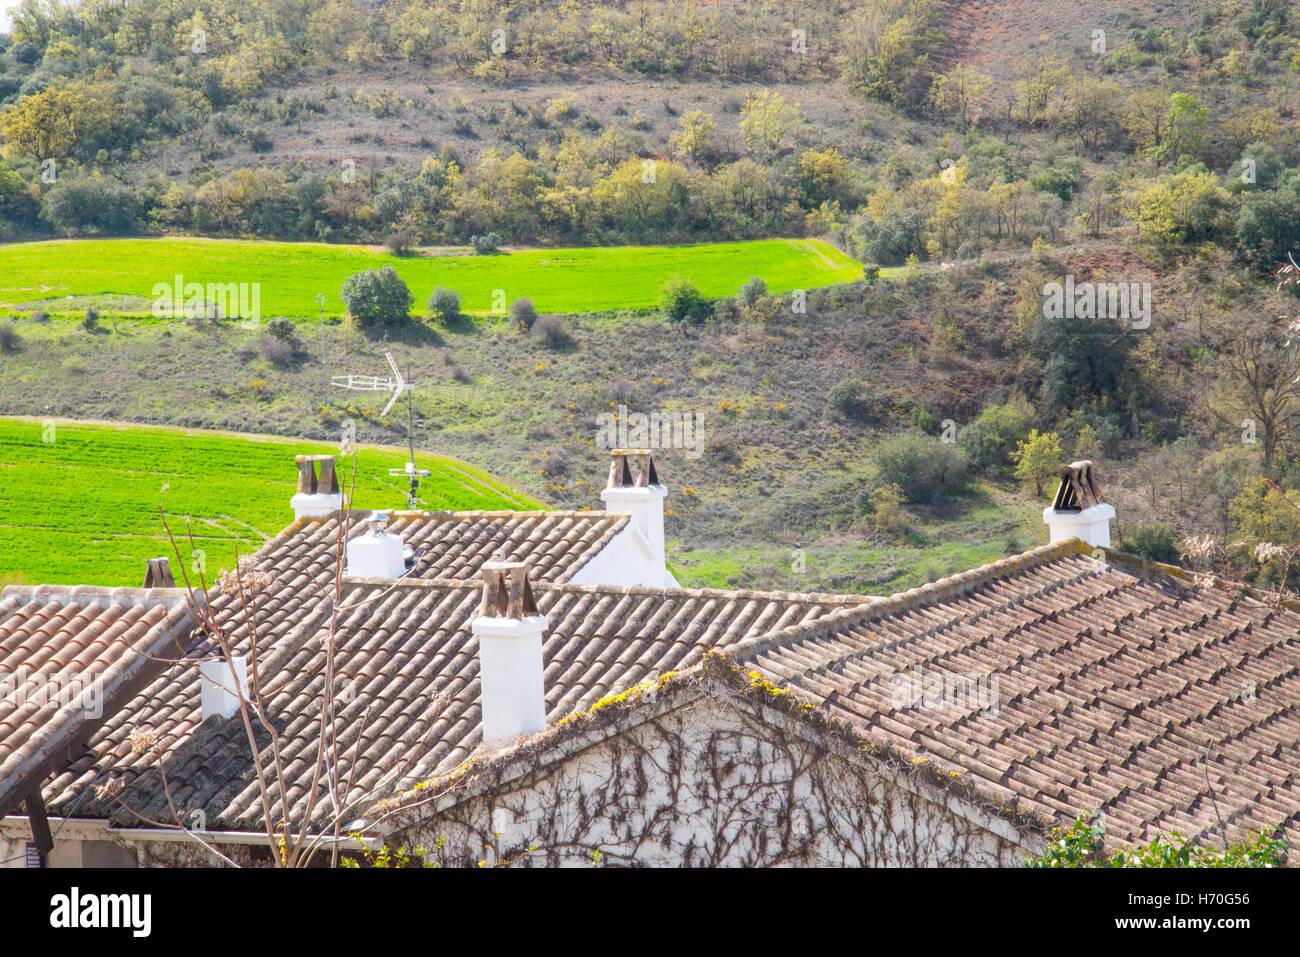 Tiled roofs and chimneys. Olmeda de las Fuentes, Madrid province, Spain. - Stock Image